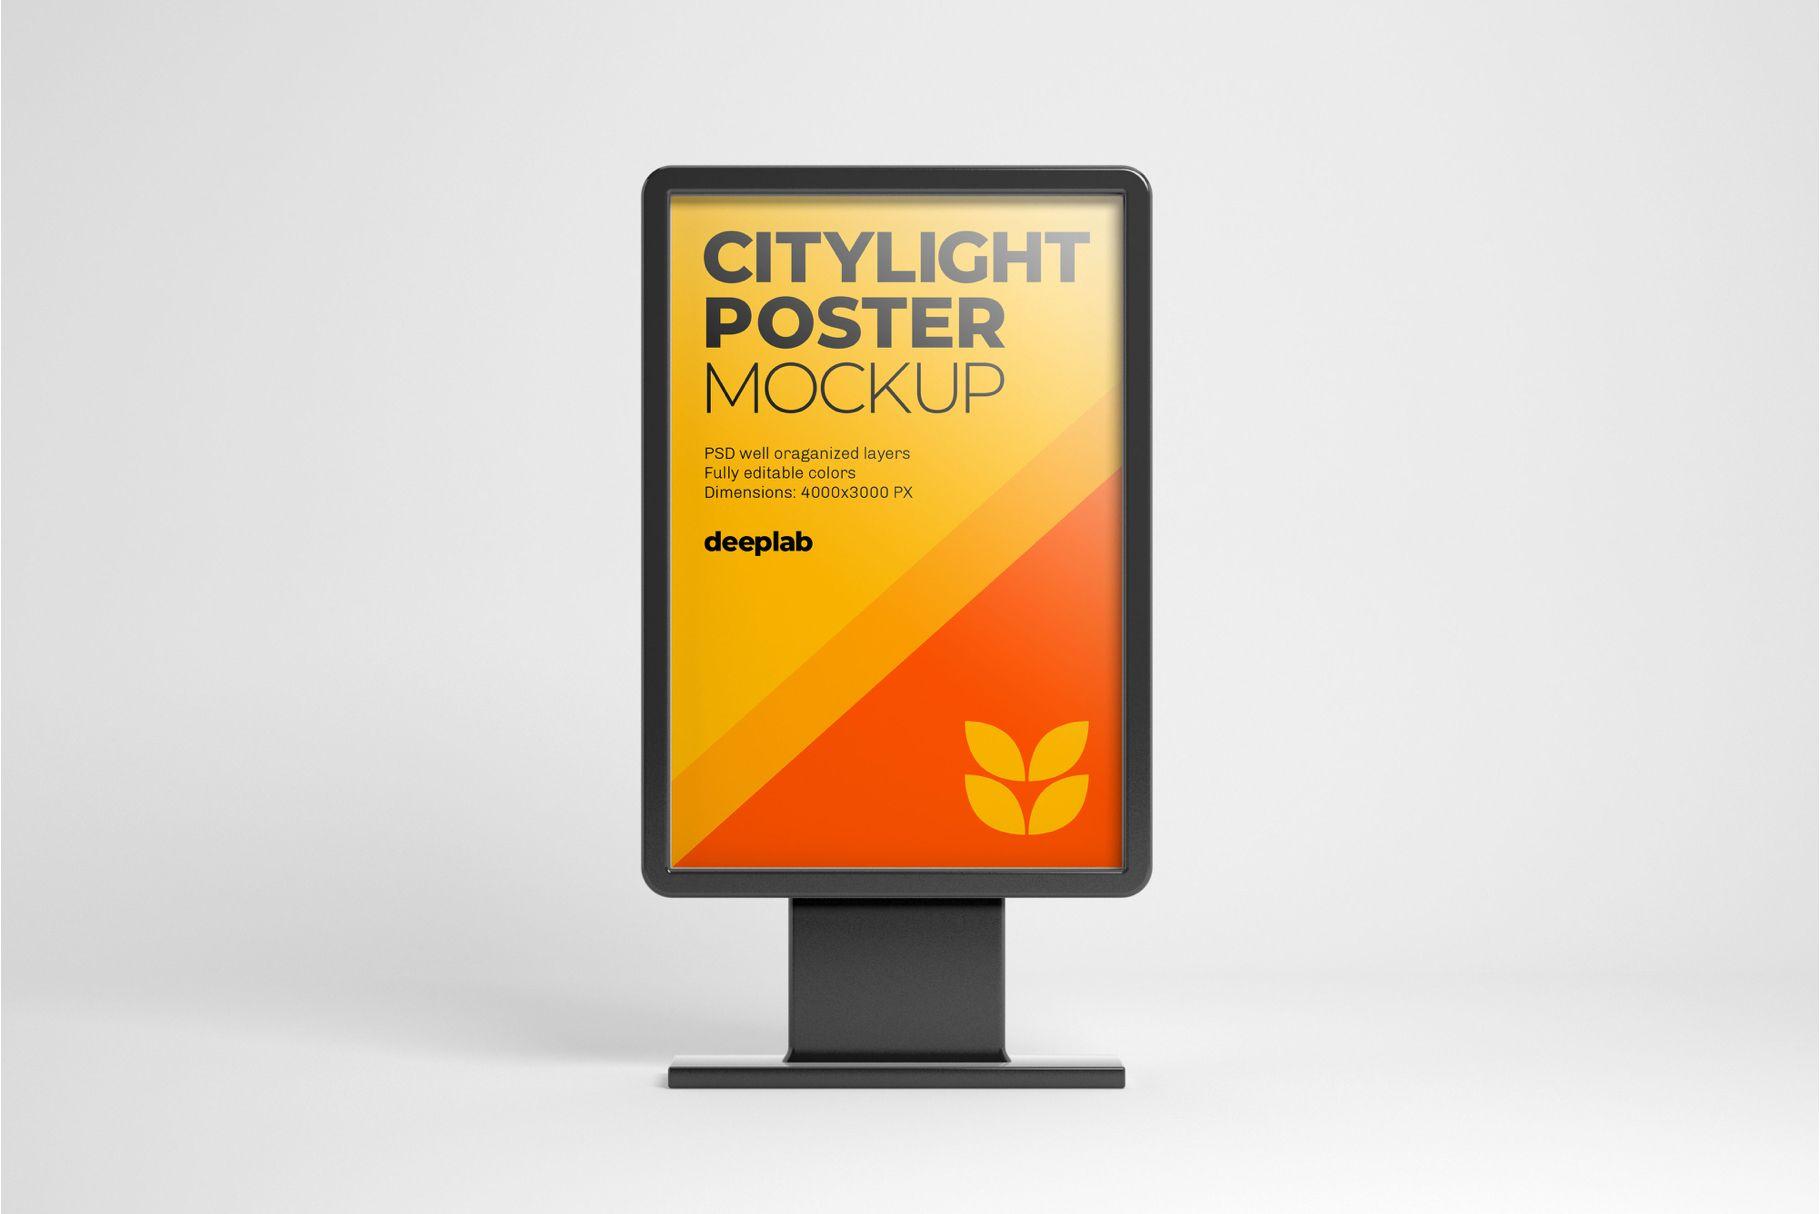 Citylight Digital Poster Mockup Poster Mockup Poster Mockup Psd Outdoor Advertising Mockup